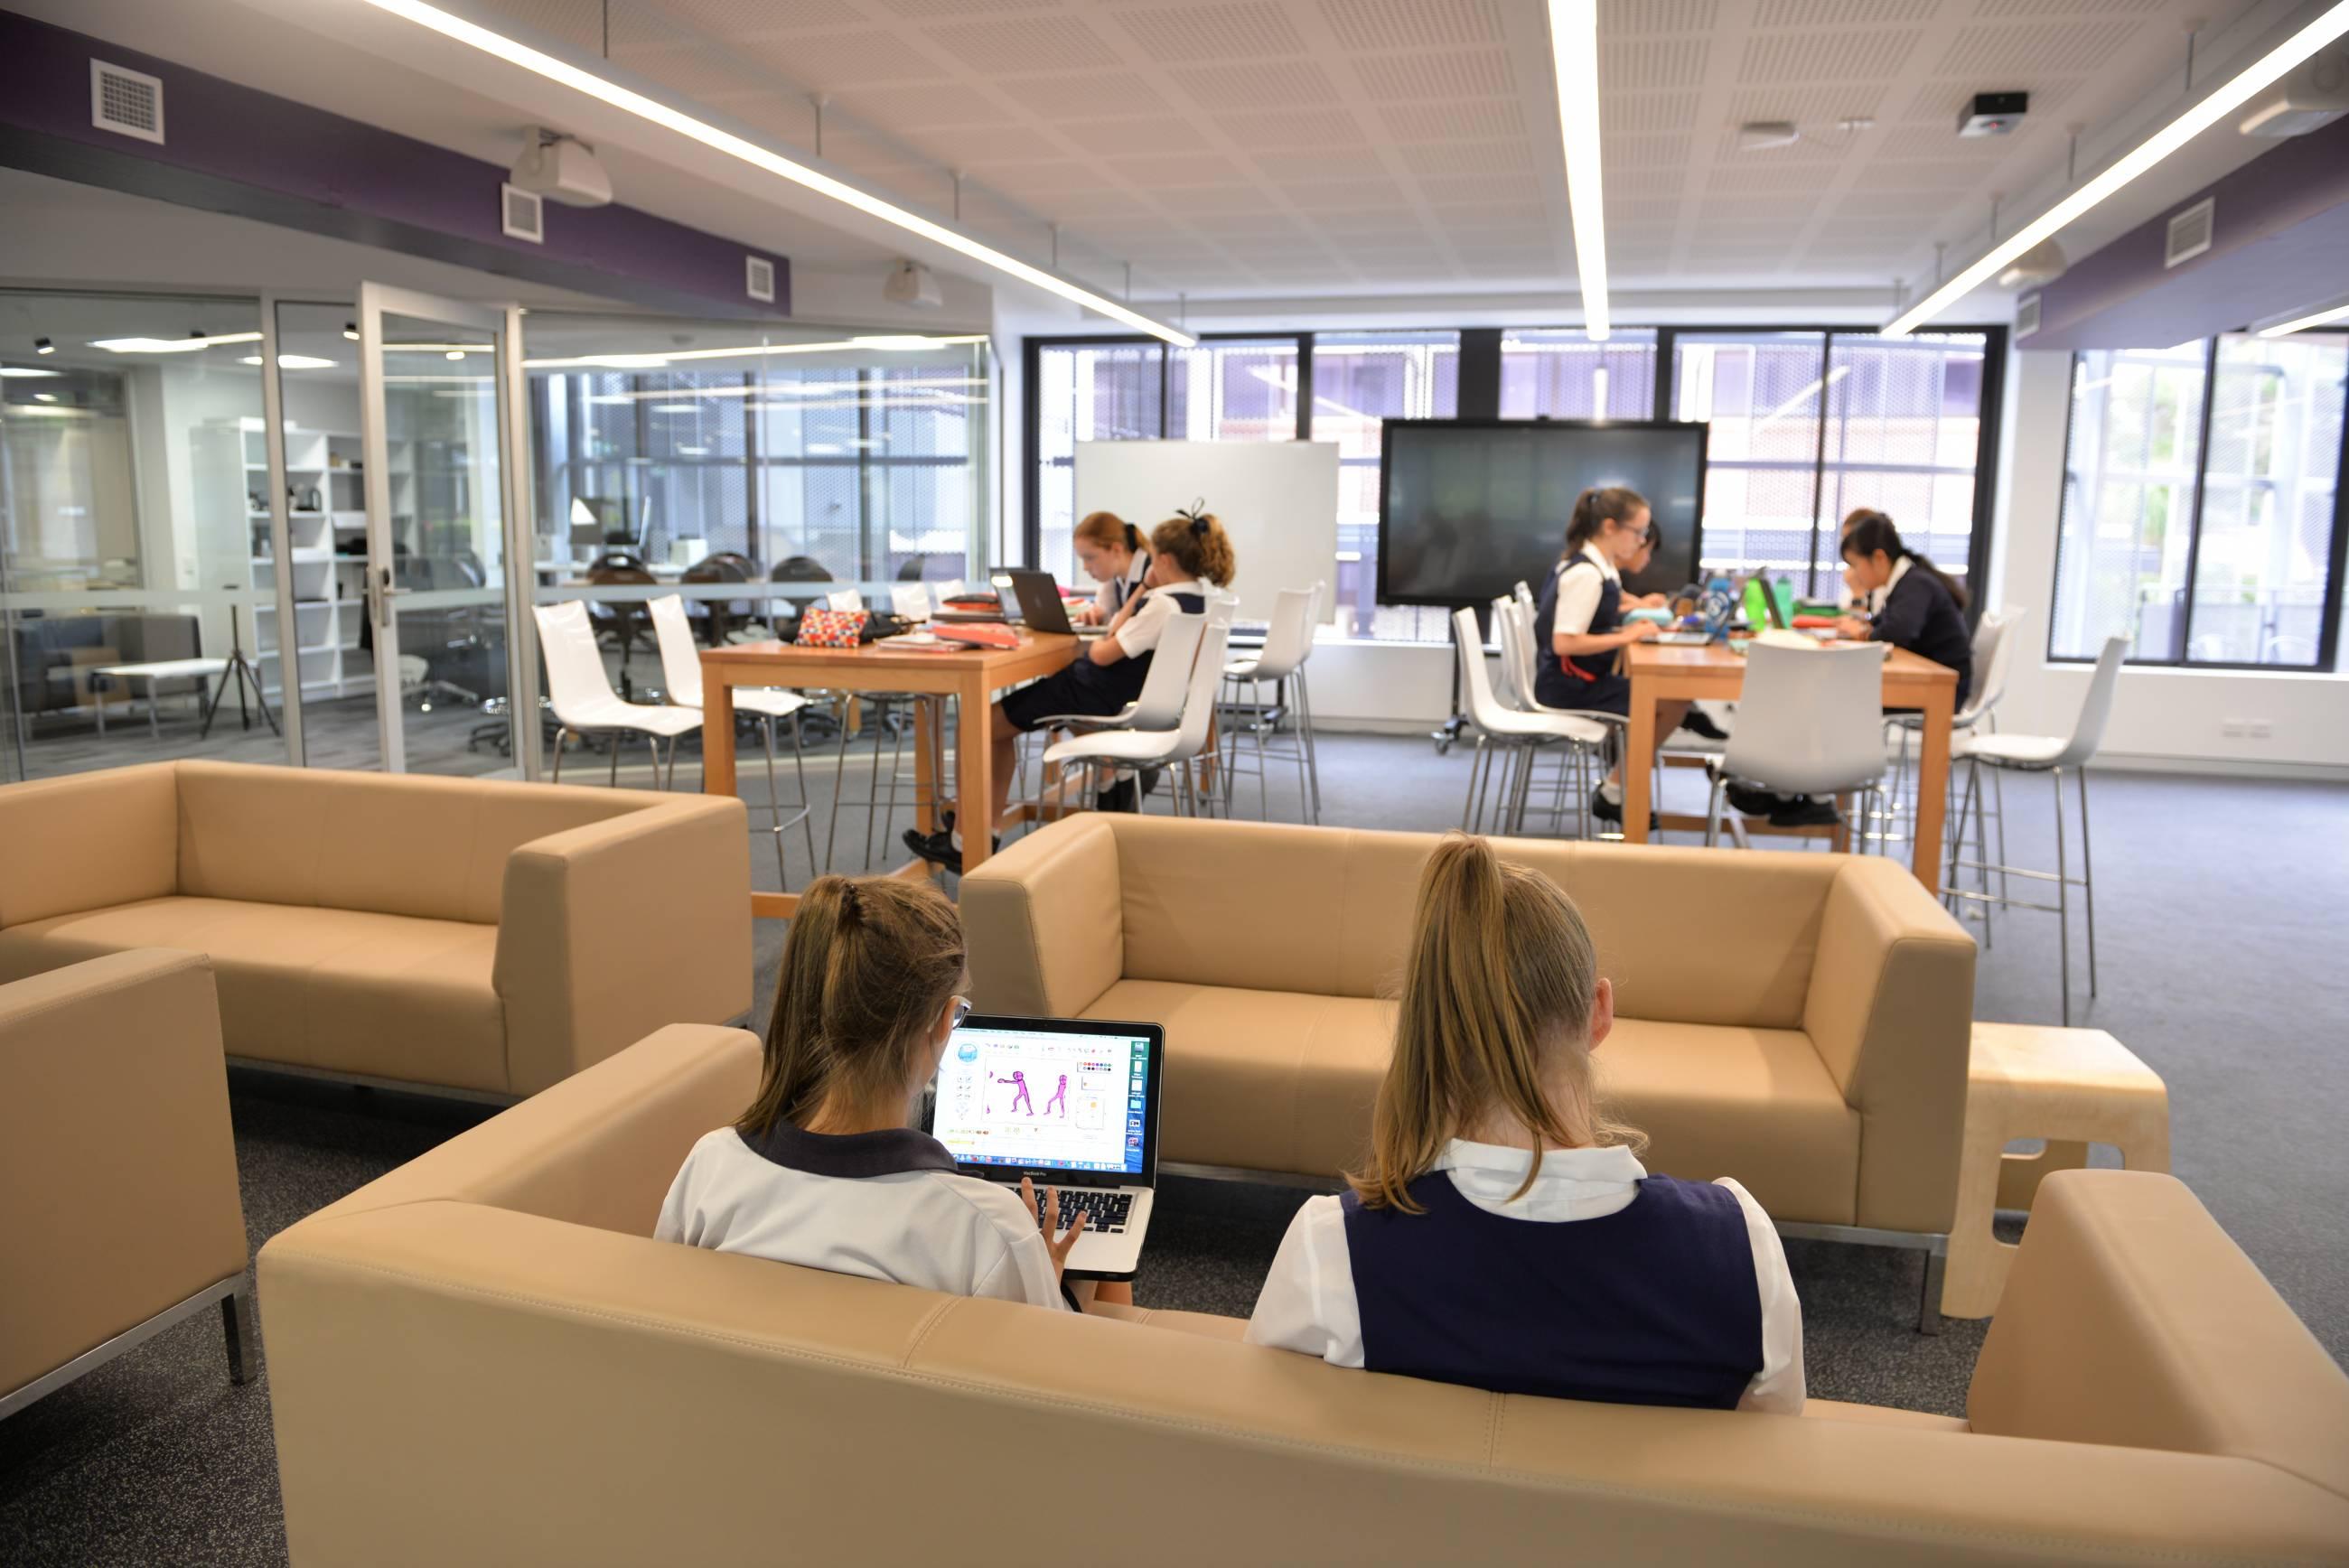 Innovative Classroom Furniture Australia ~ Design in modern education st hilda s school